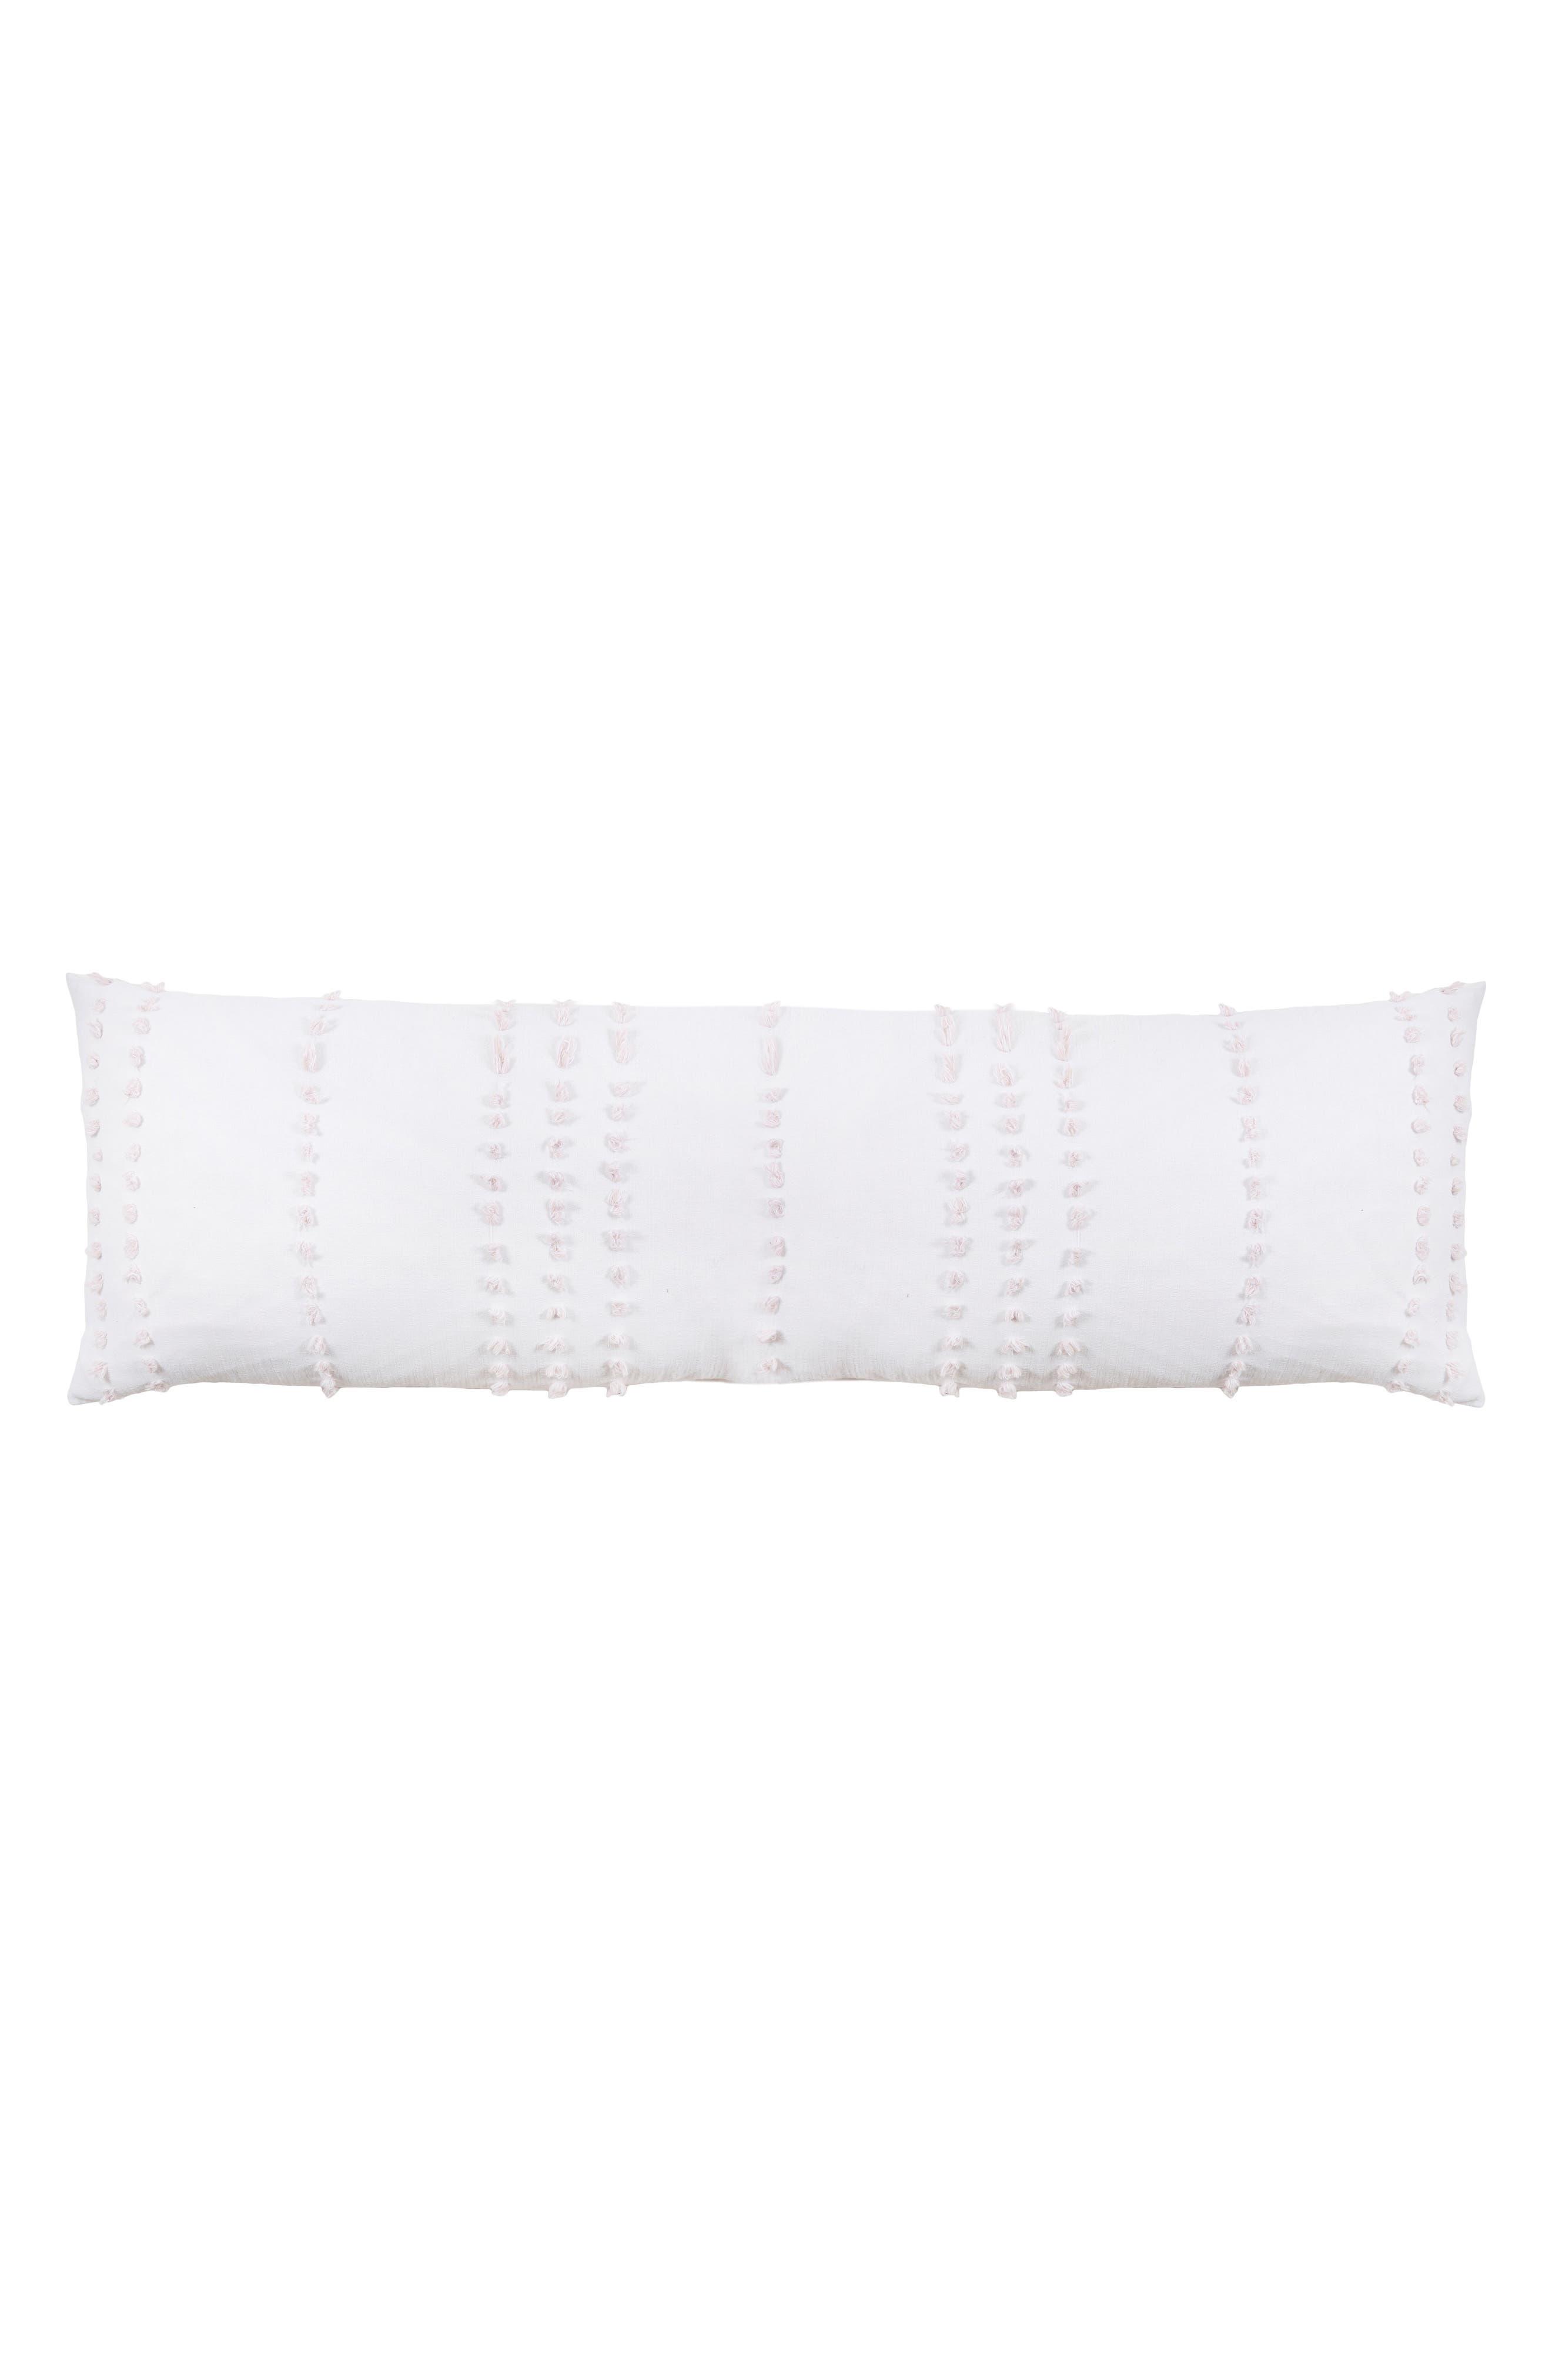 Poppy Body Pillow,                         Main,                         color, WHITE/ BLUSH